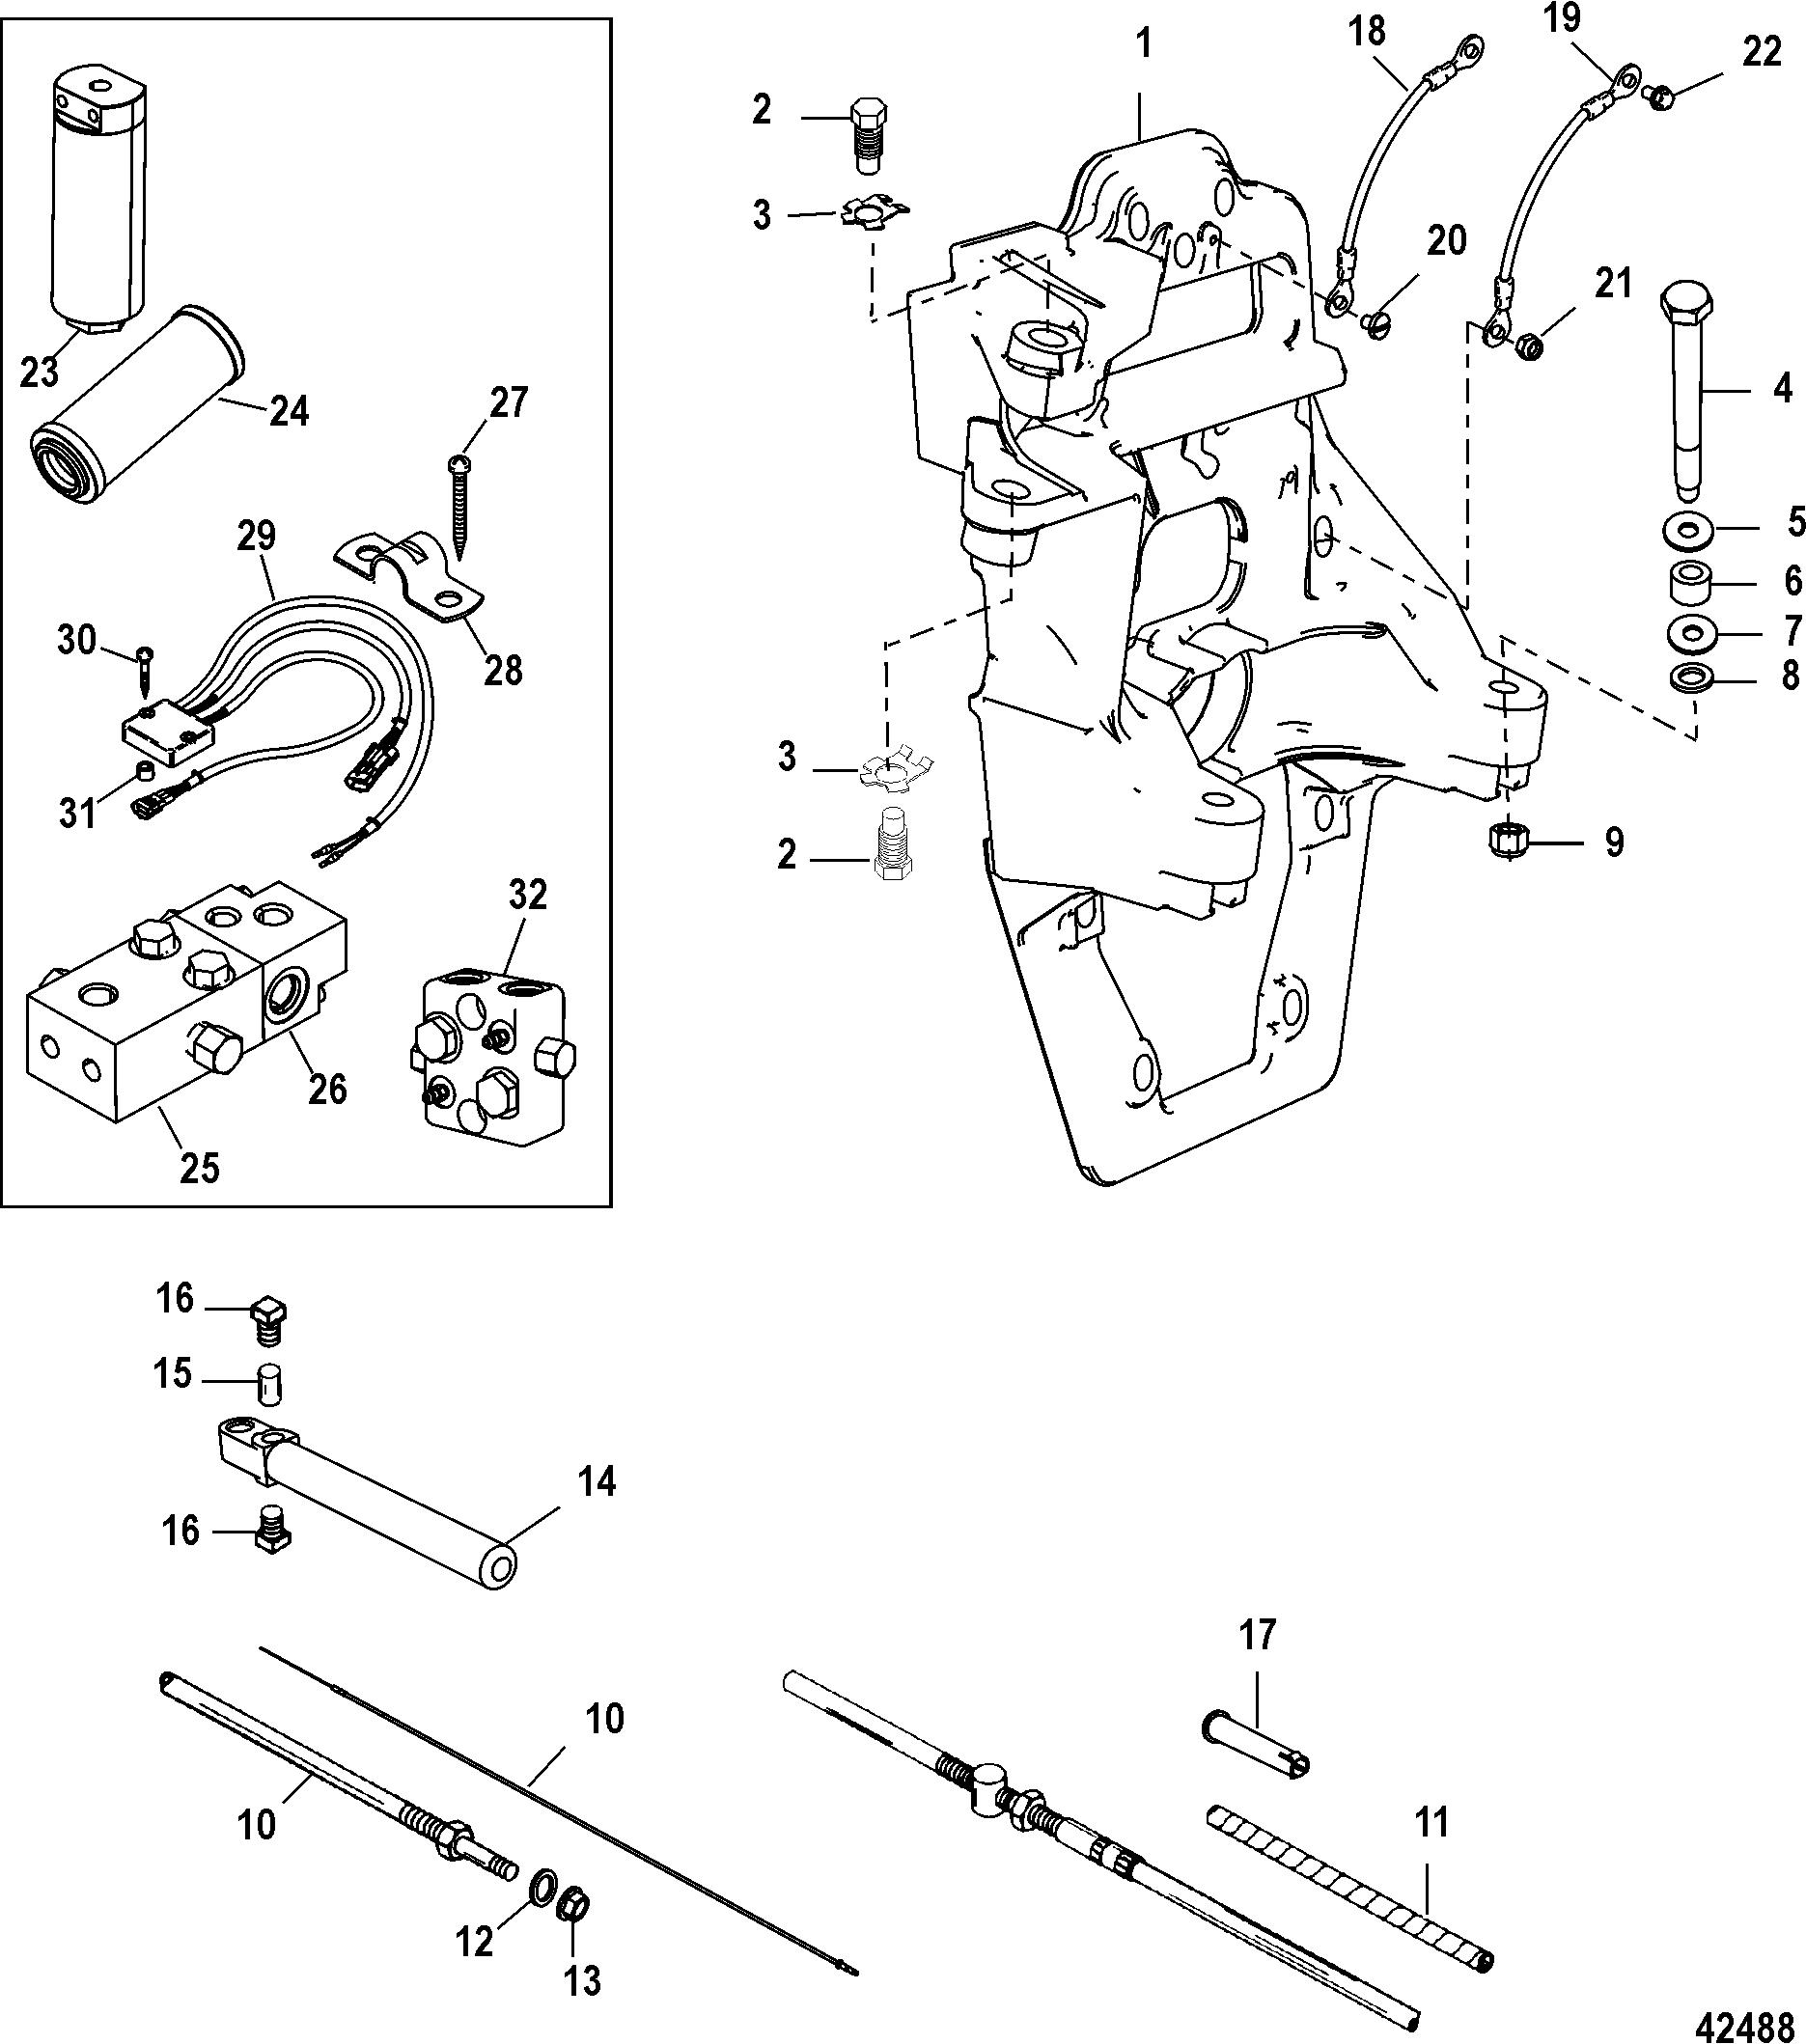 Hardin Marine - Transom Plate and Shift CableHardin Marine